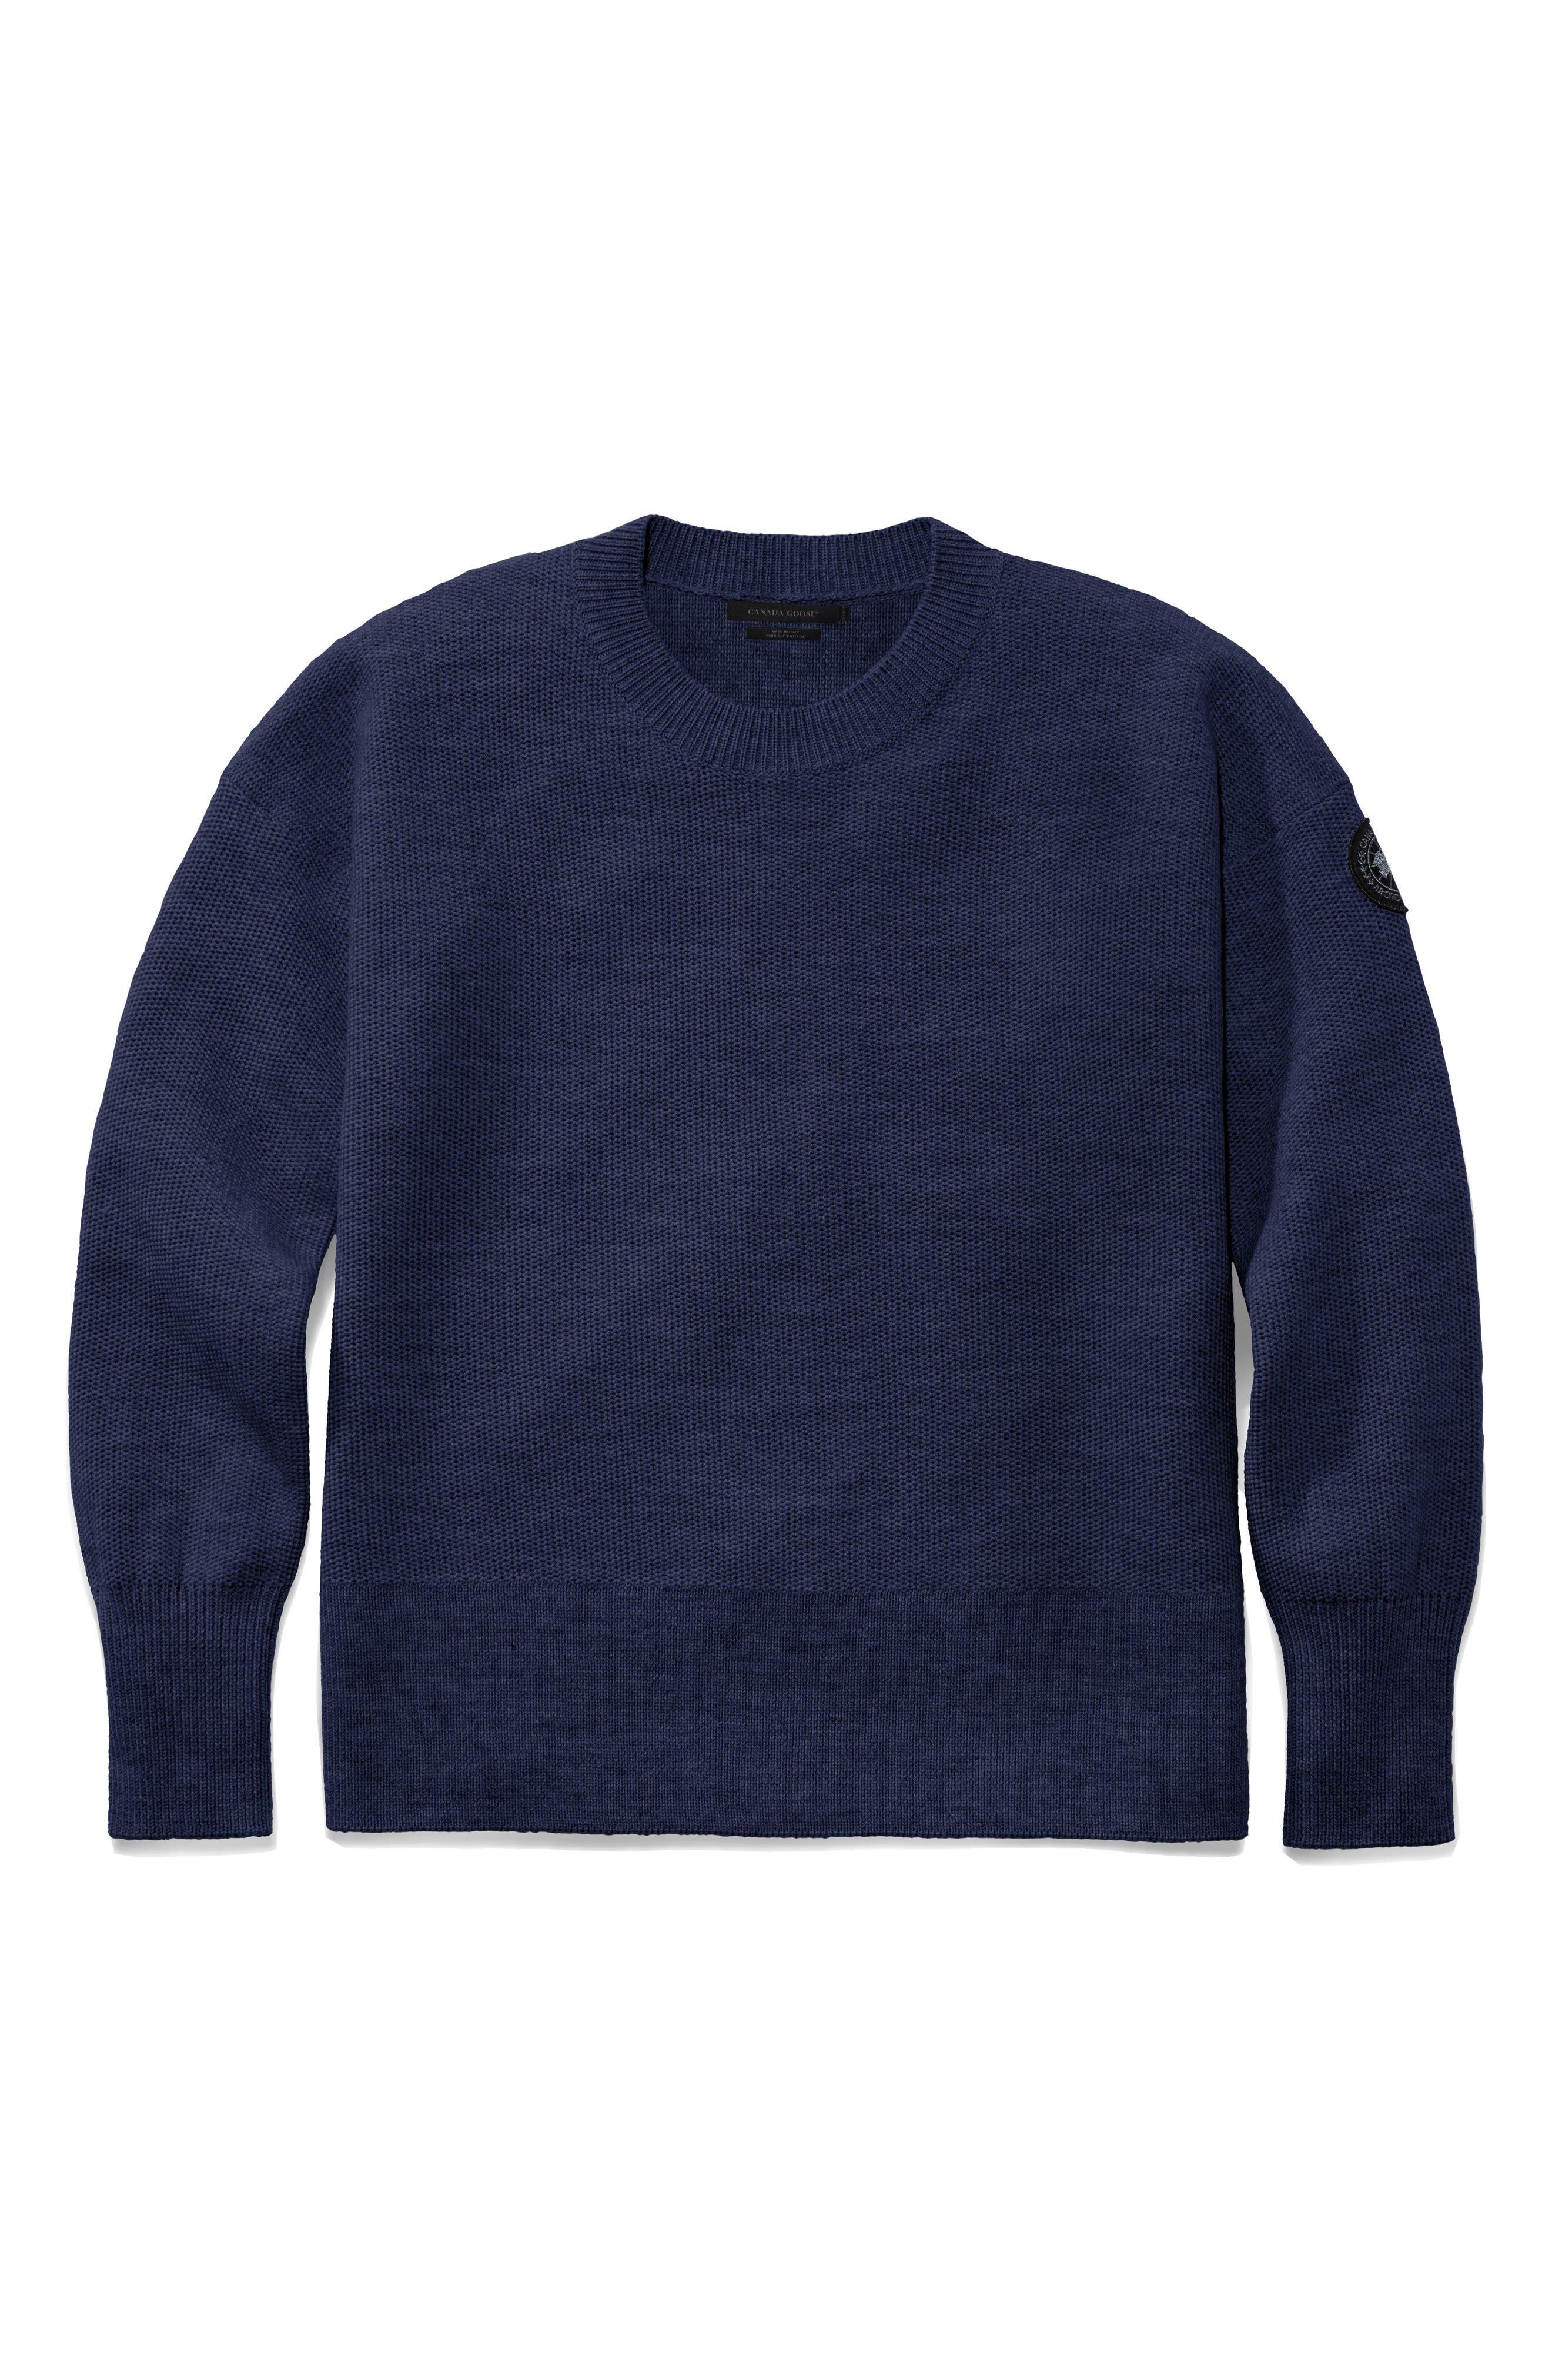 Canada Goose Aleza Merino Wool Sweater, (10-12) - Blue